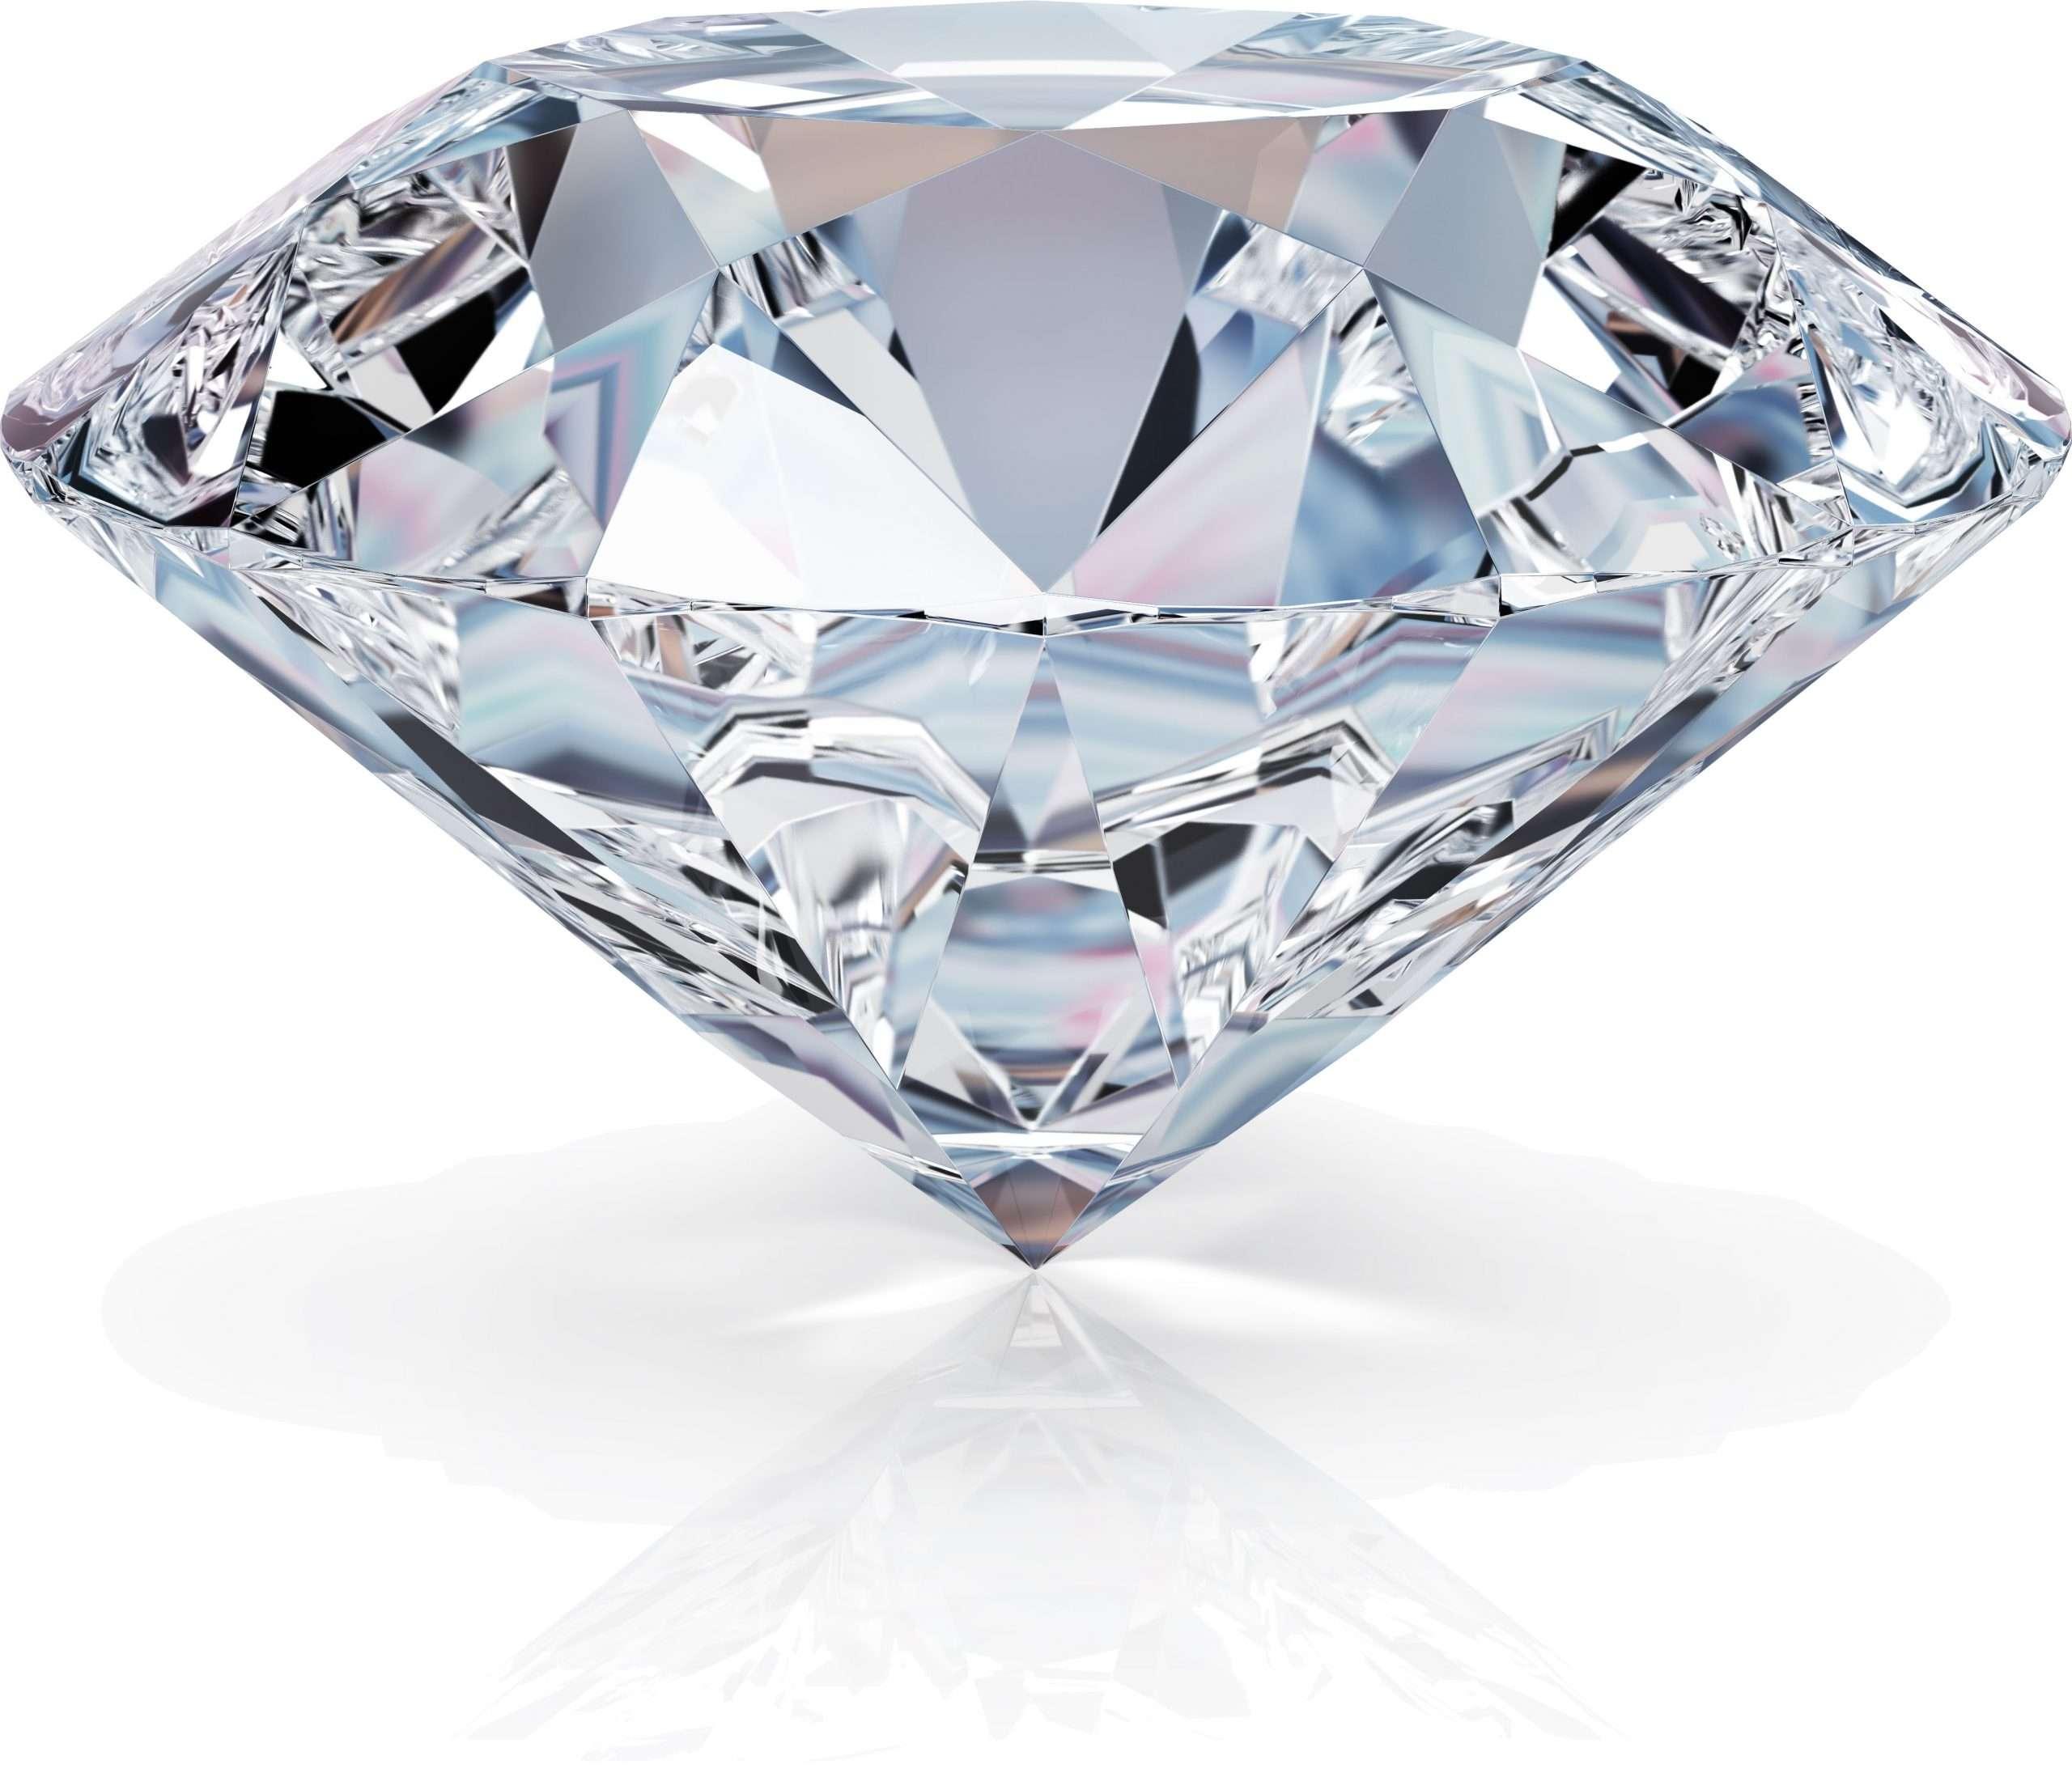 Diamond Inventory Software 3